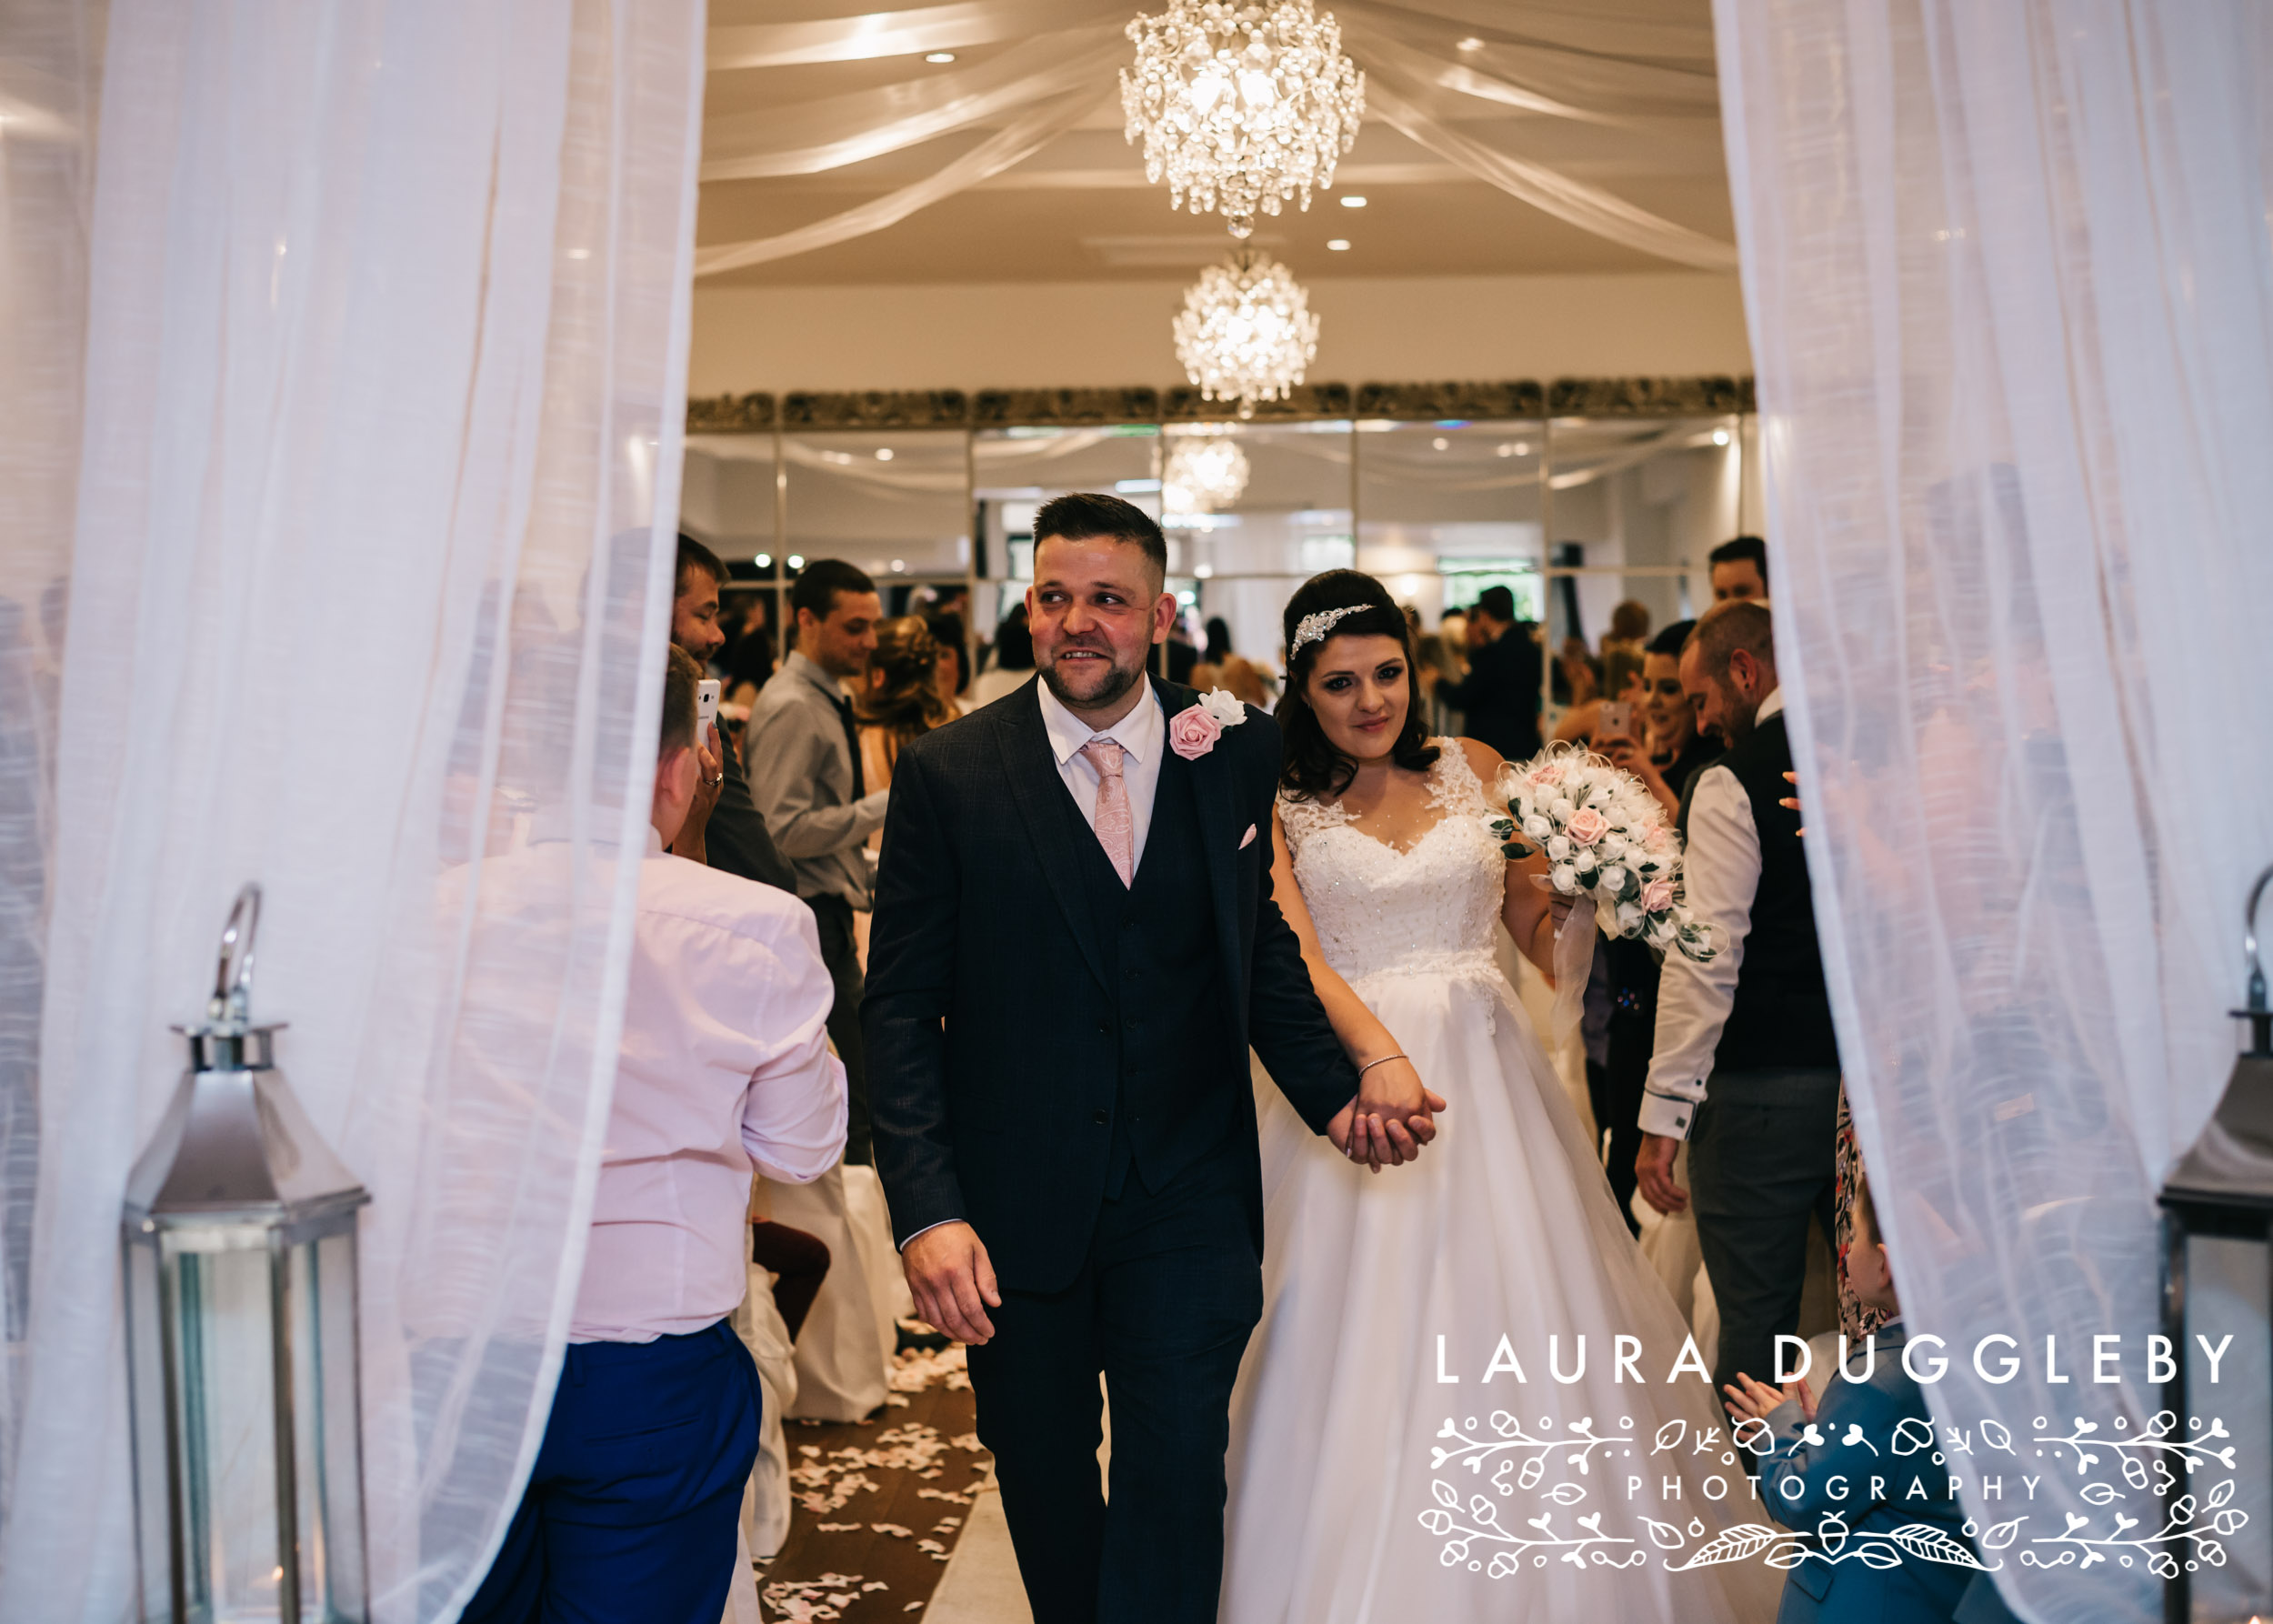 Sparth House Wedding - Lancashire Wedding Photographer6